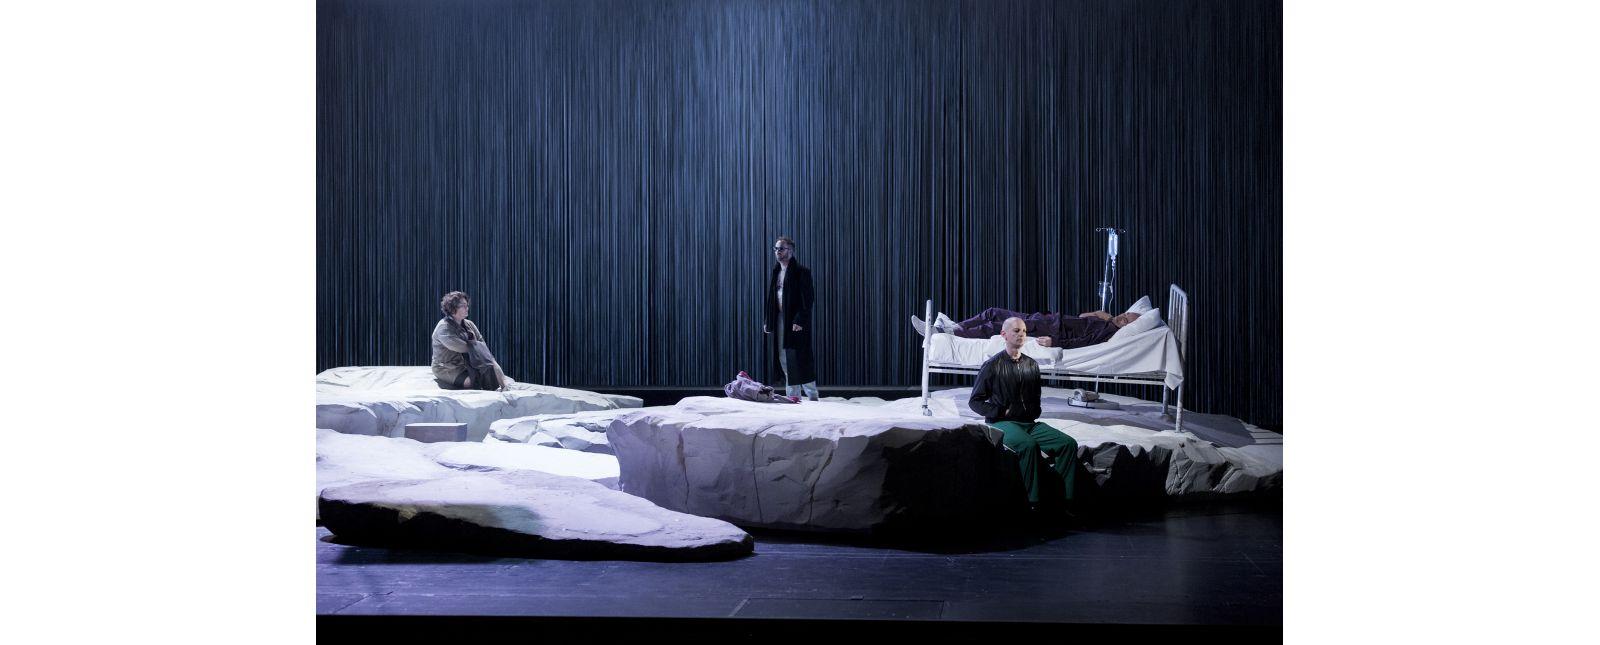 Angels in America // Anja Jung, Robin Adams, Bernhard Landauer, Andreas Jankowitsch // Rainer Muranyi // 2018